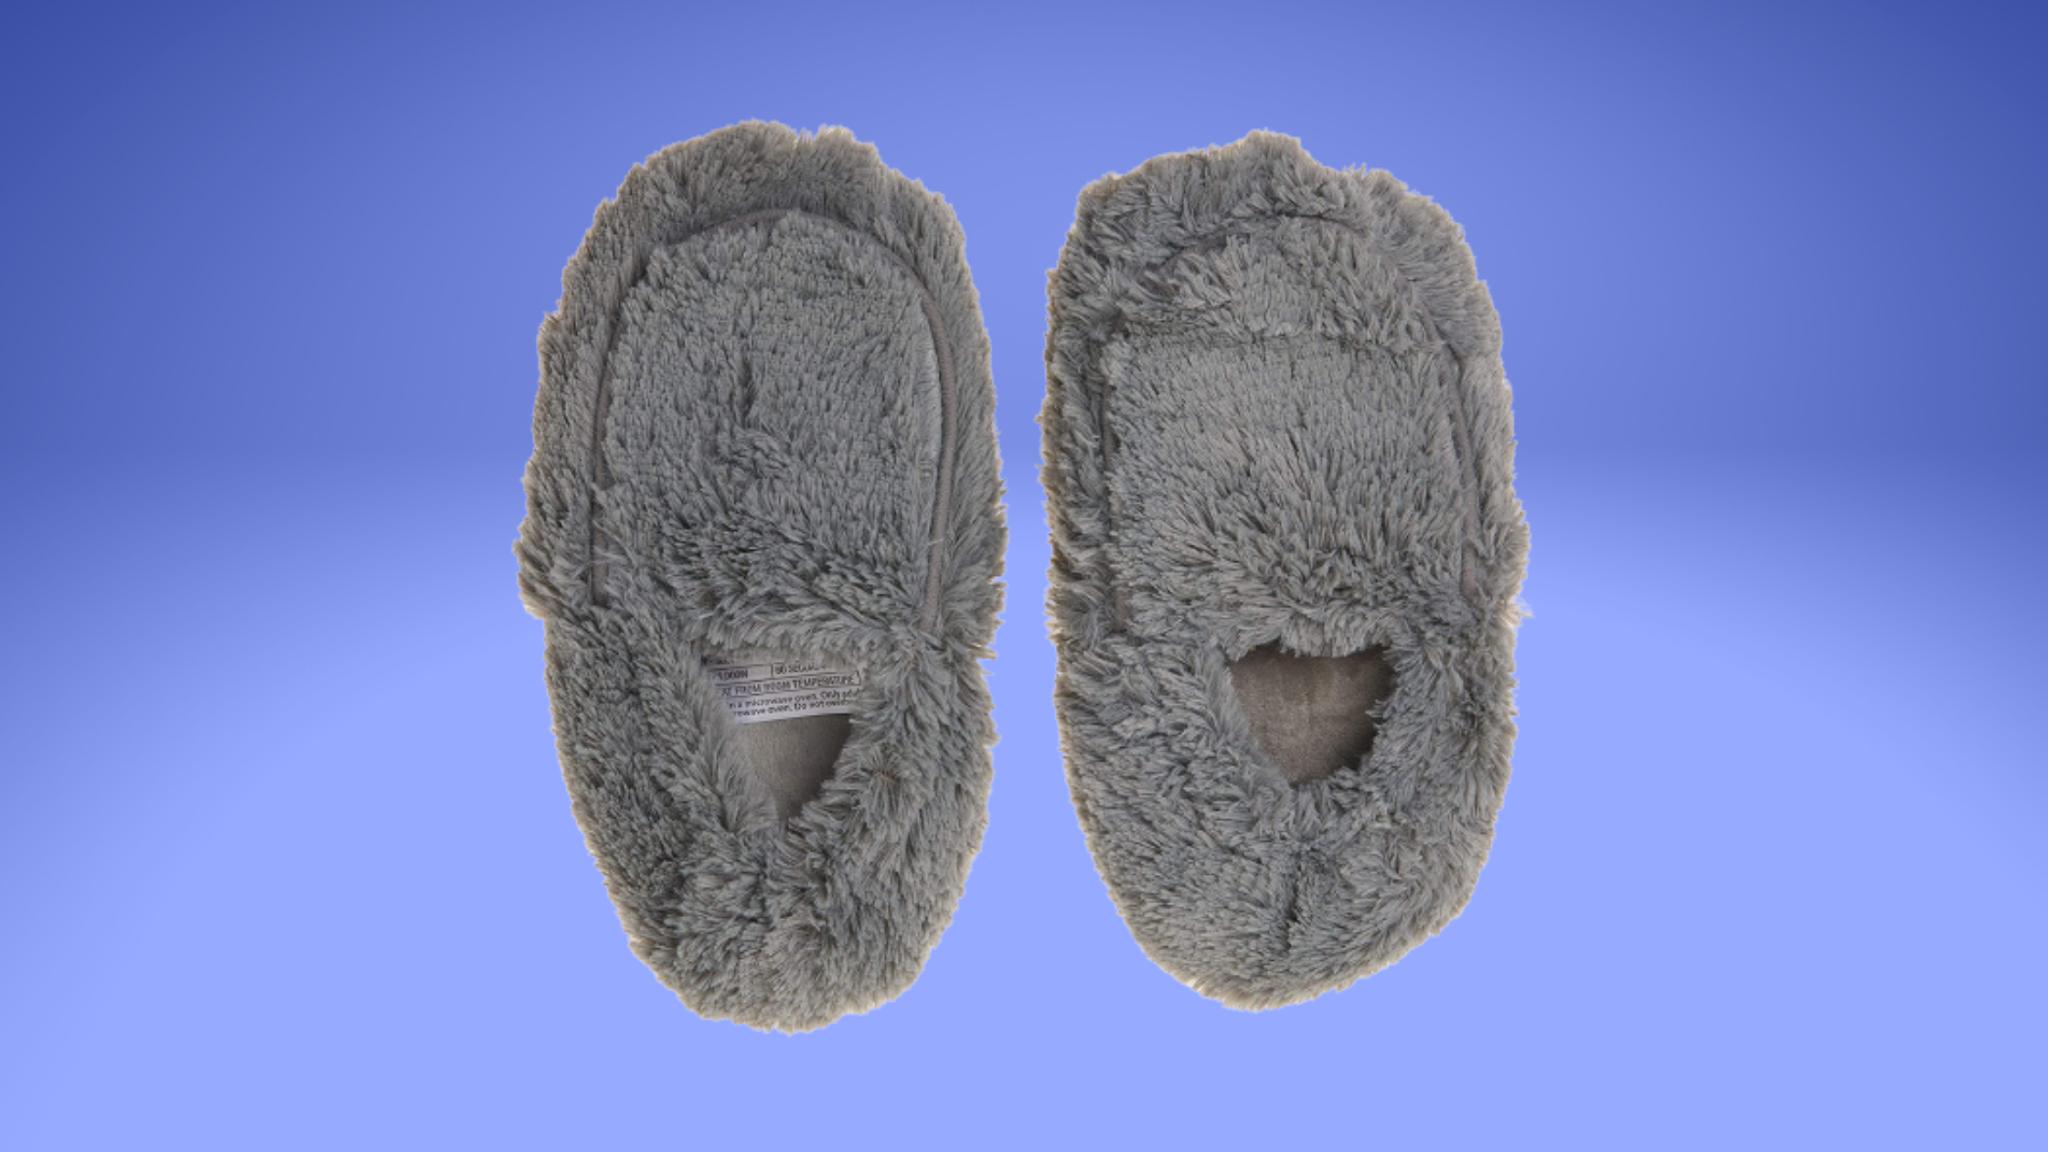 The Best Intelex Warmies Slippers Review   Budget Gadgets4u